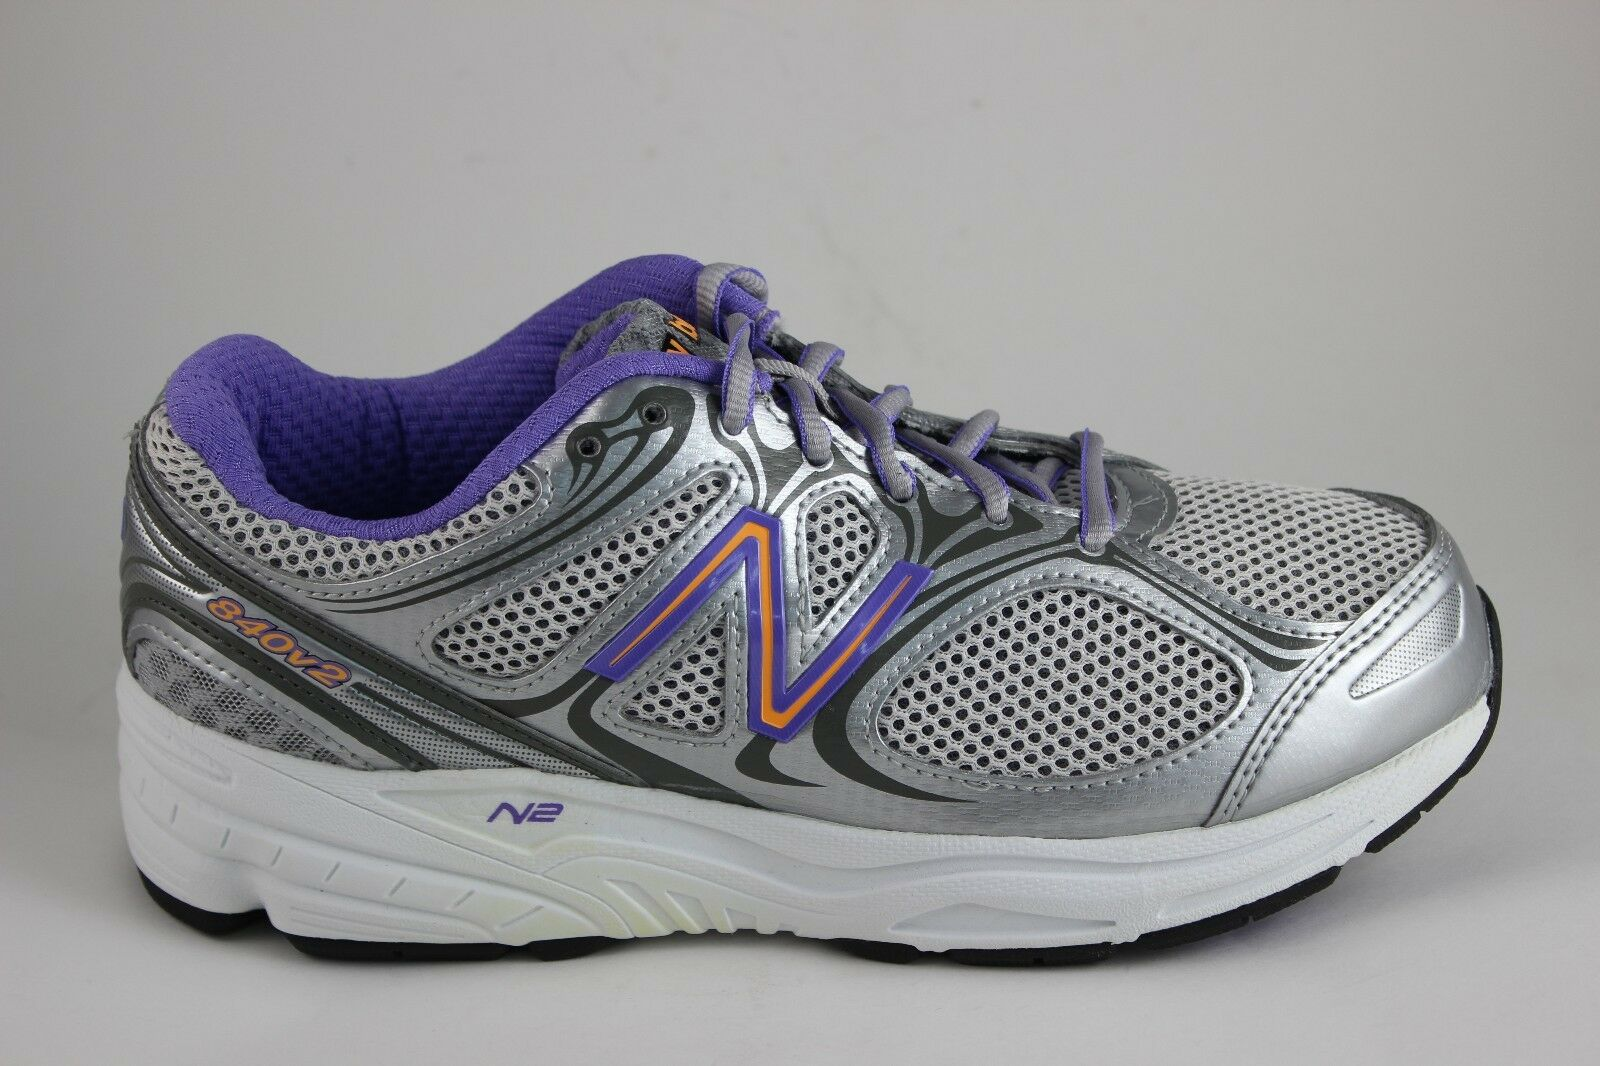 Mujer New Balance Atletismo 840 v2 Plata Púrpura blancoo W840SP2 Nuevo